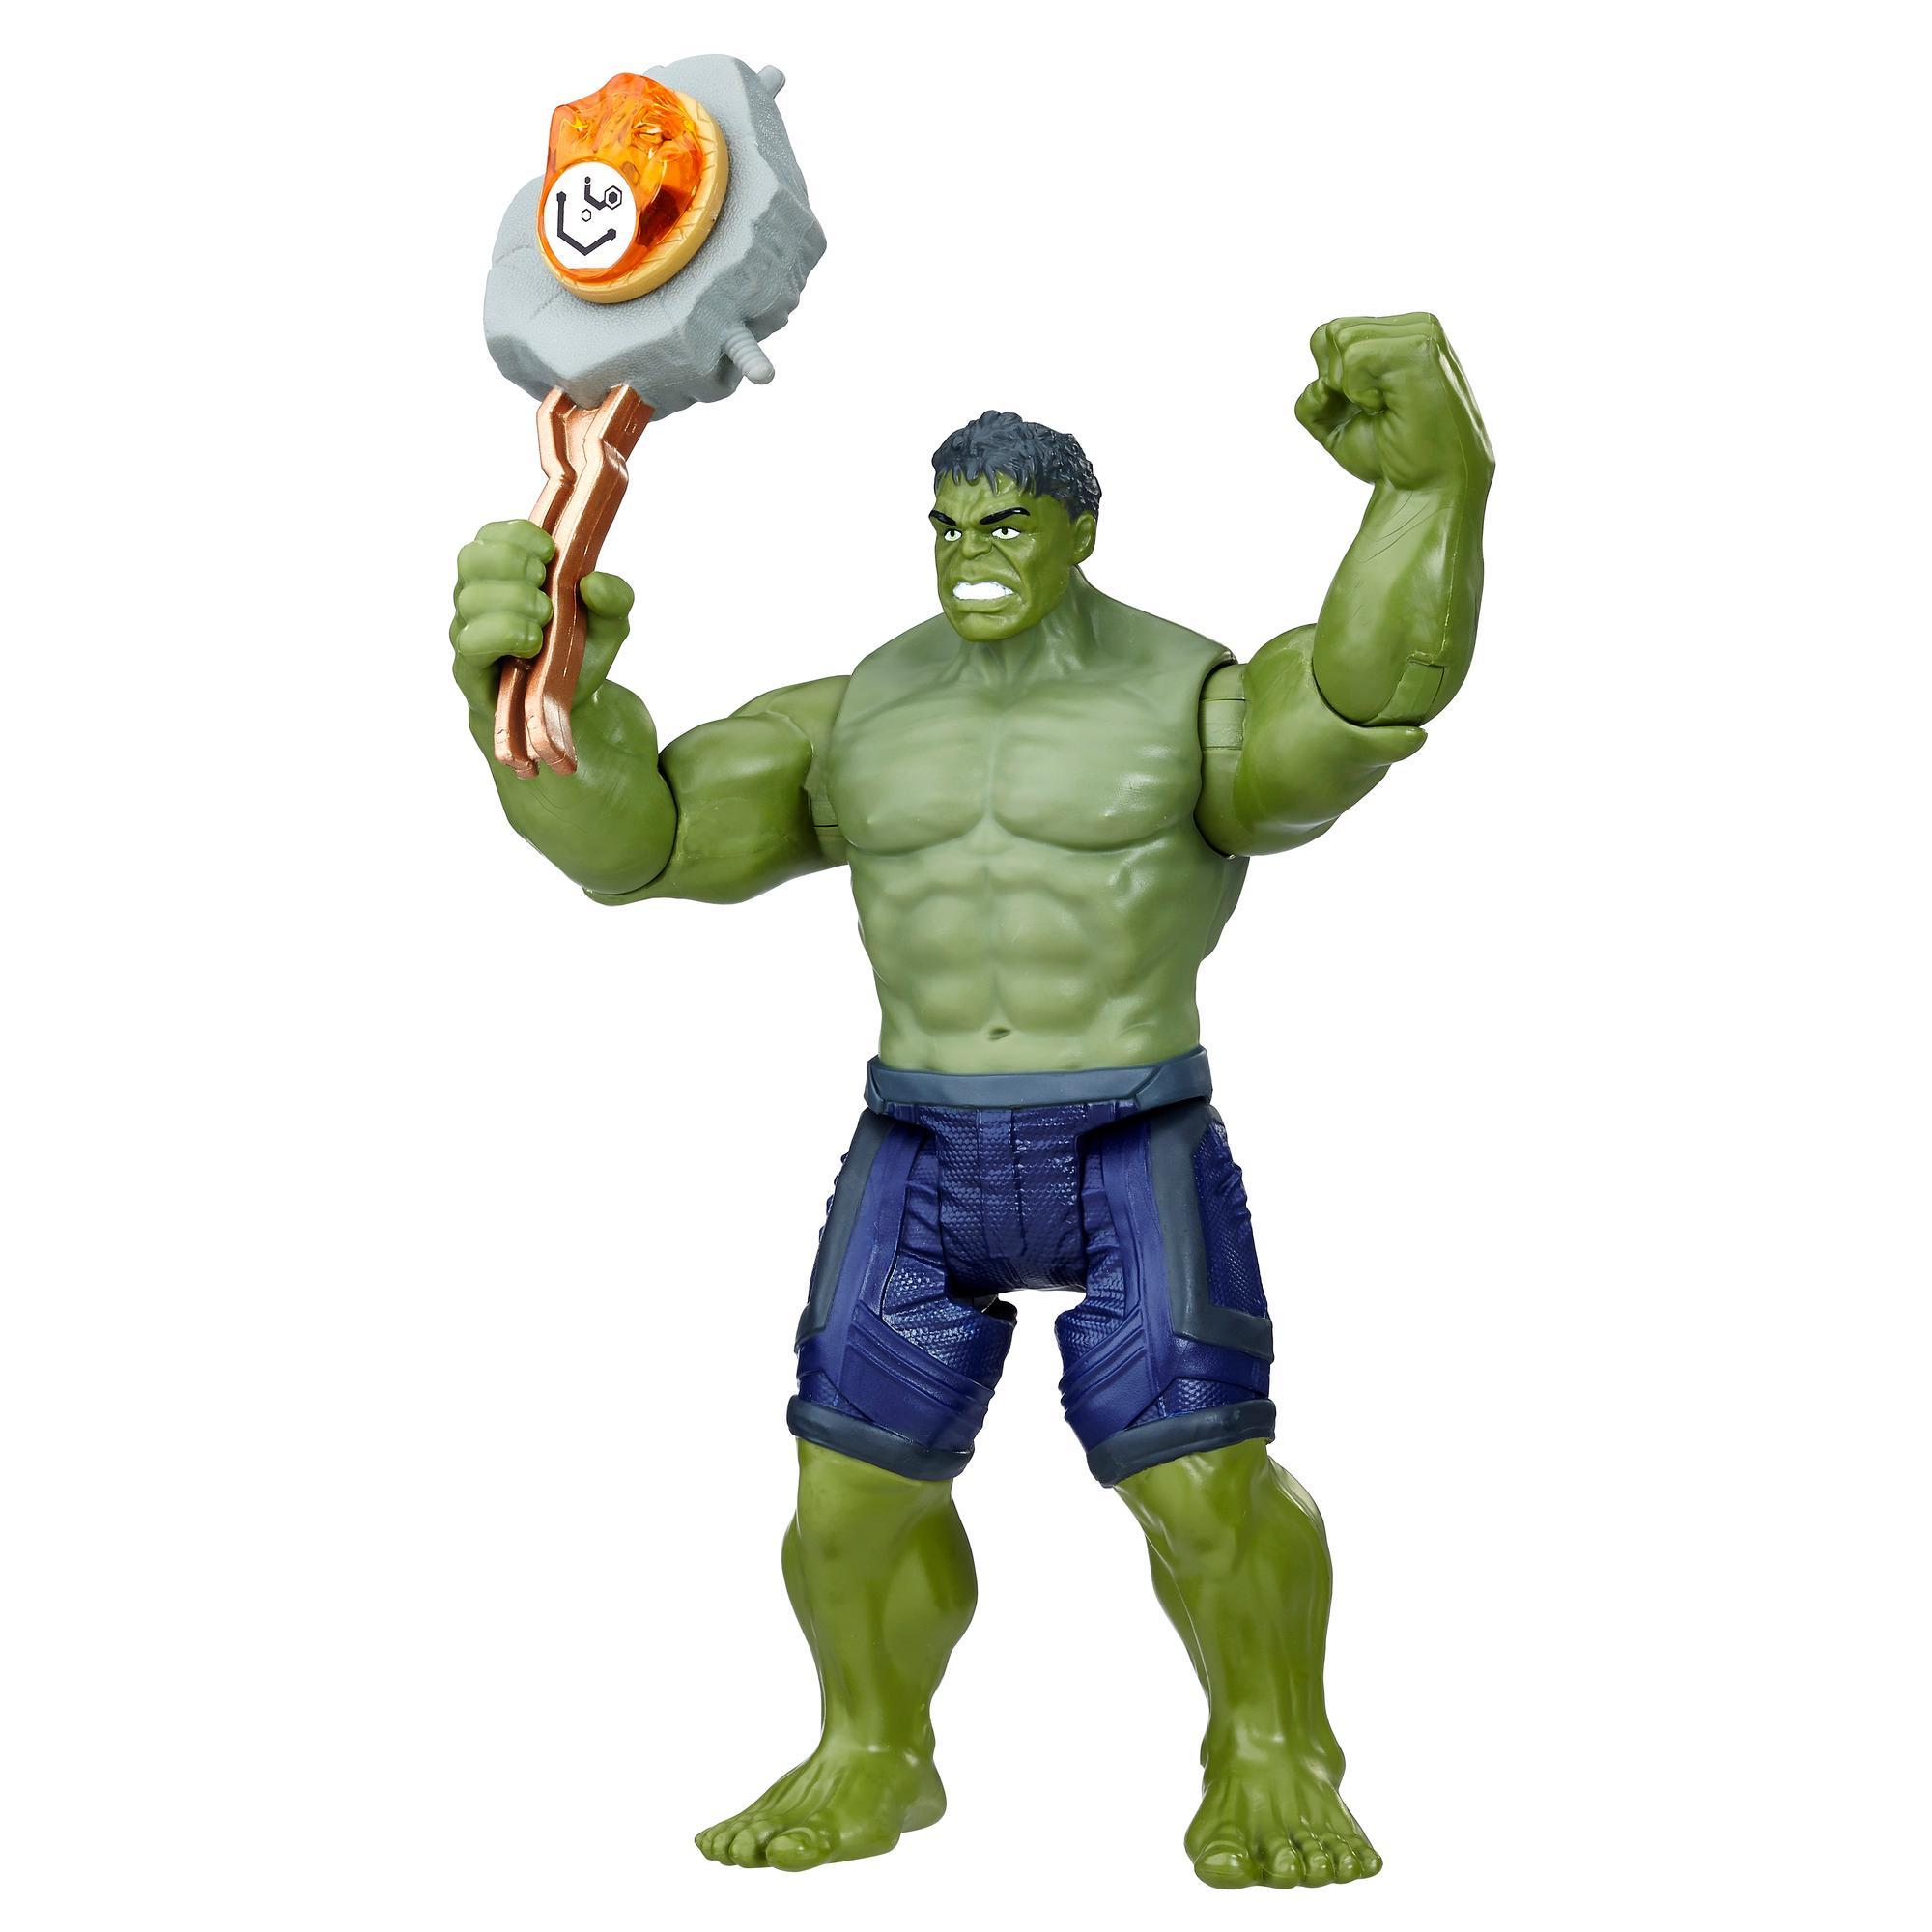 Marvel Avengers: Infinity War Hulk with Infinity Stone